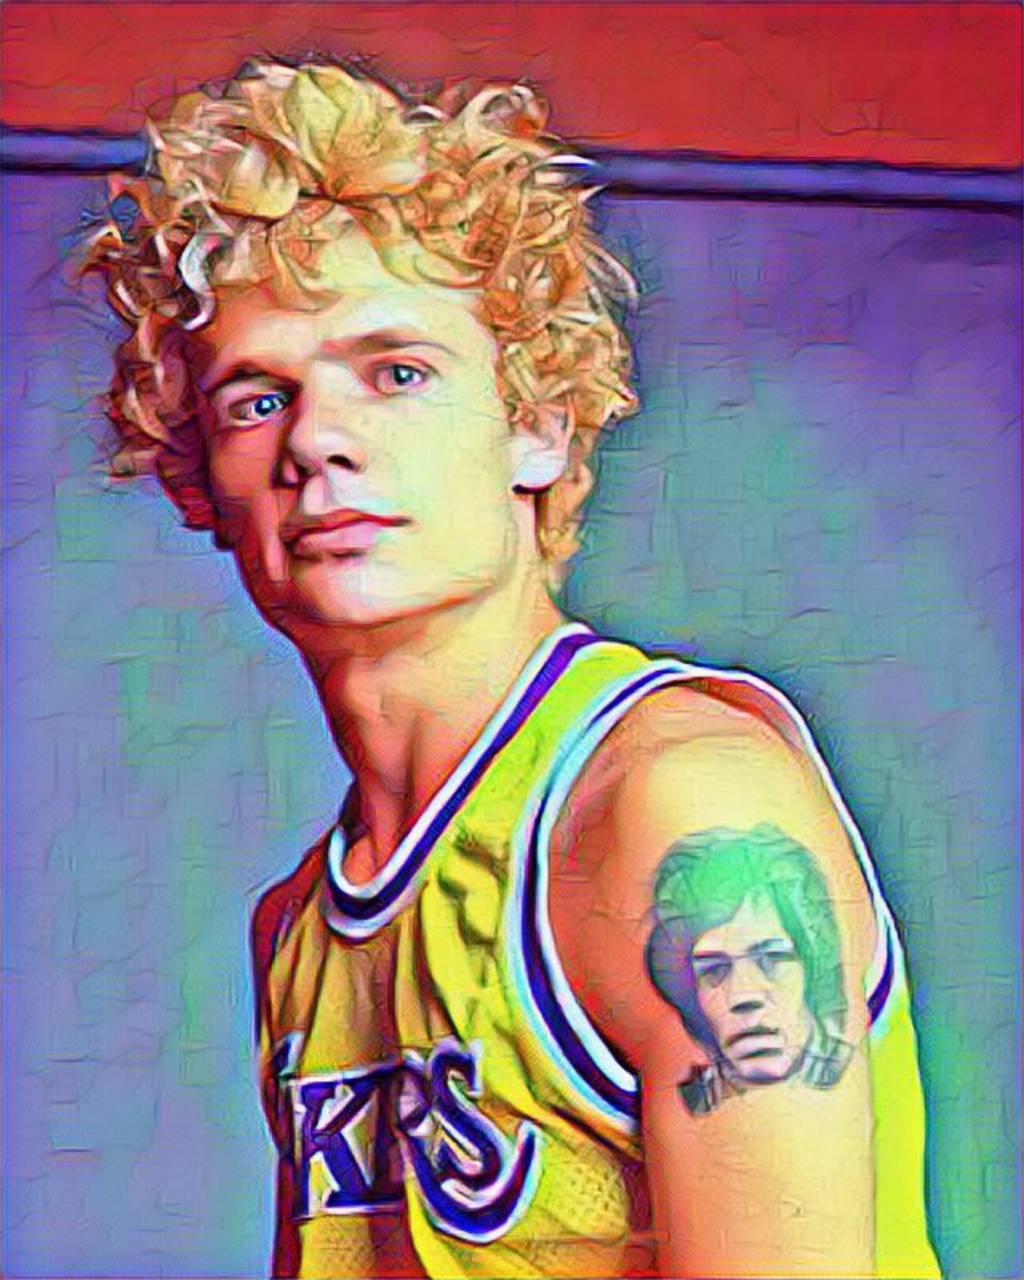 Fellow Flea Wallpaper By Auntbootsy 84 Free On Zedge